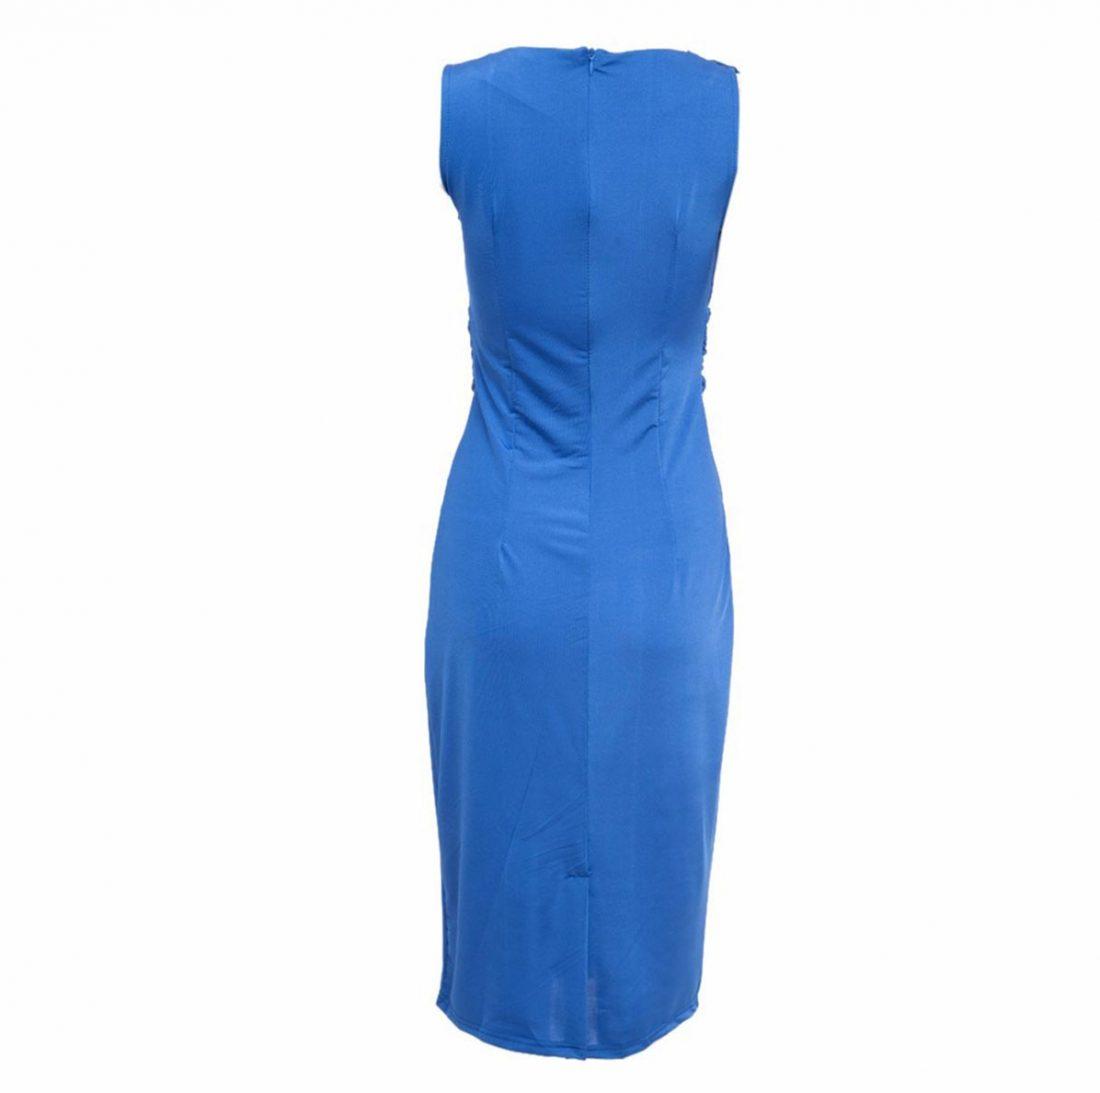 M0188 blue3 Short Sleeve Dresses maureens.com boutique